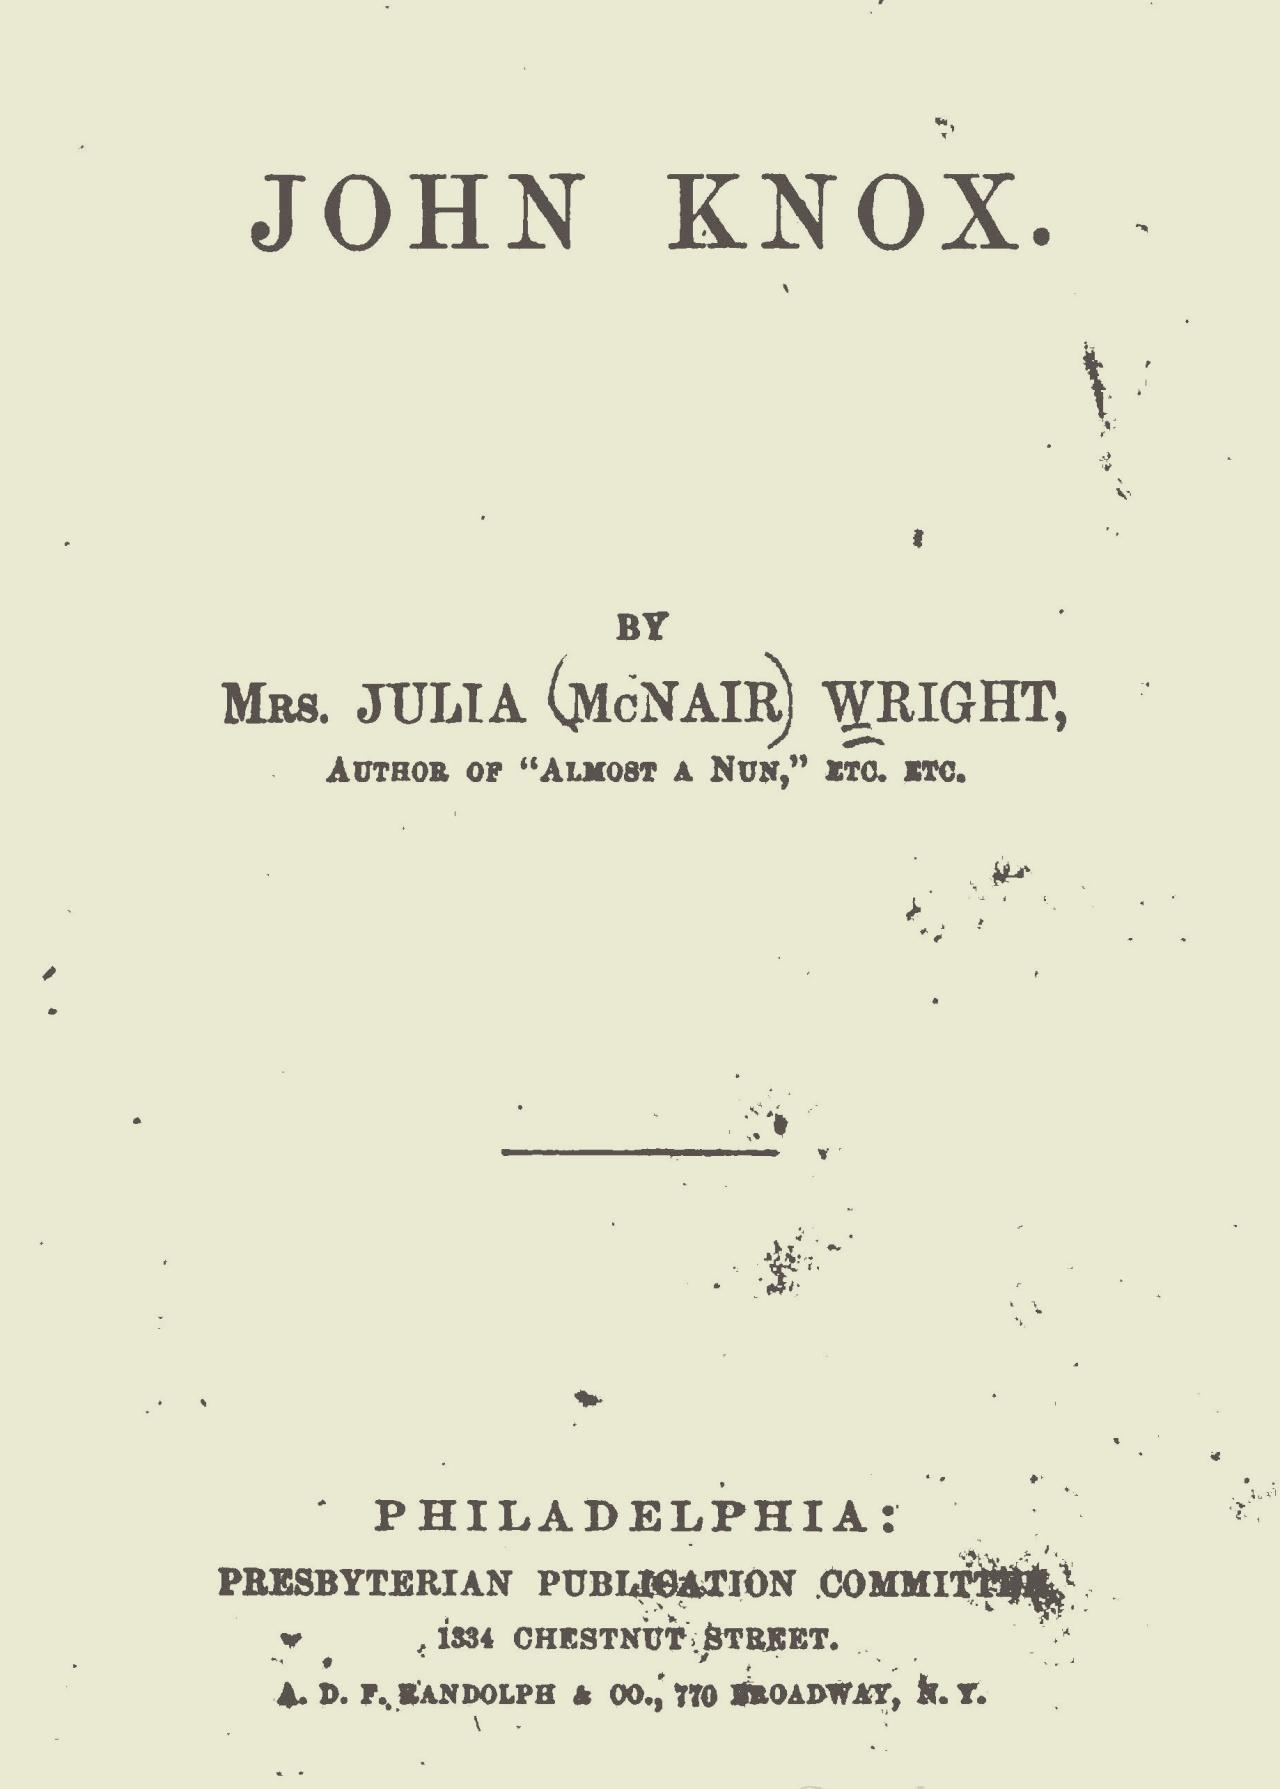 Wright, Julia McNair, John Knox Title Page.jpg